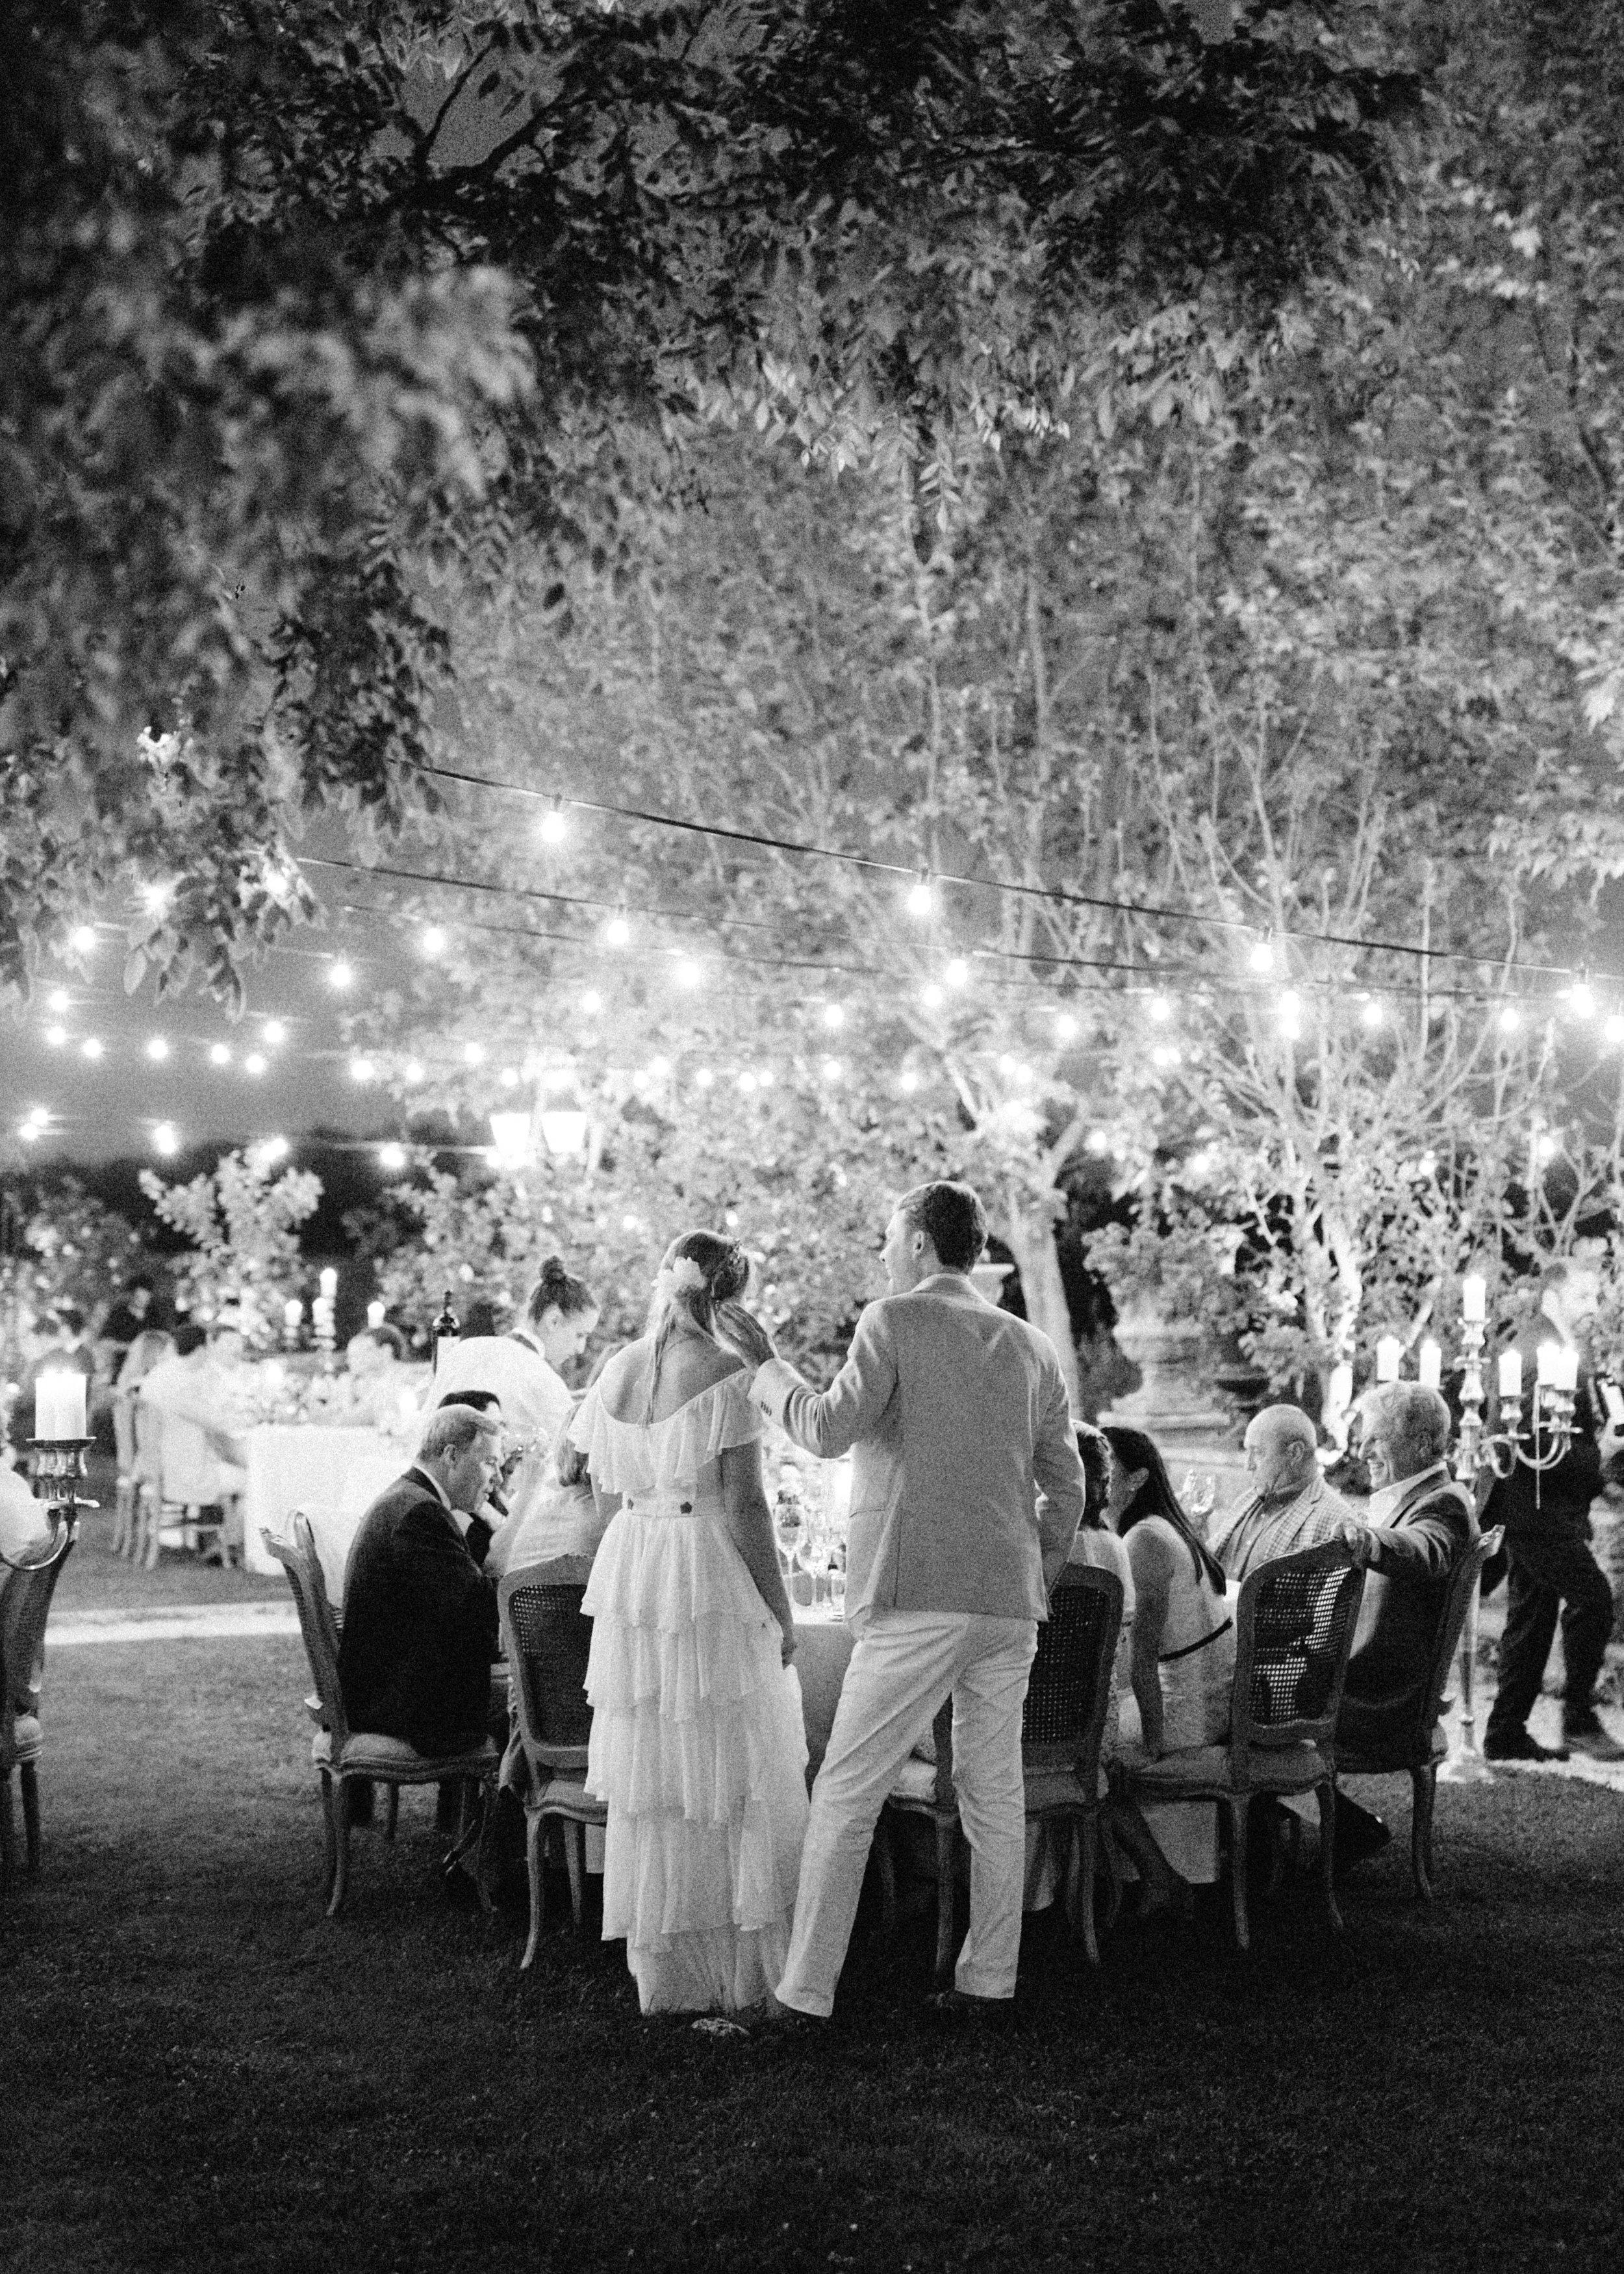 Kyle John l Fine Art Wedding Photography l Chicago, Copenhagen, California, New York, Destination l Blog l Alexis and Zach_Borgo Santo Pietro_Italy_Tuscany_72